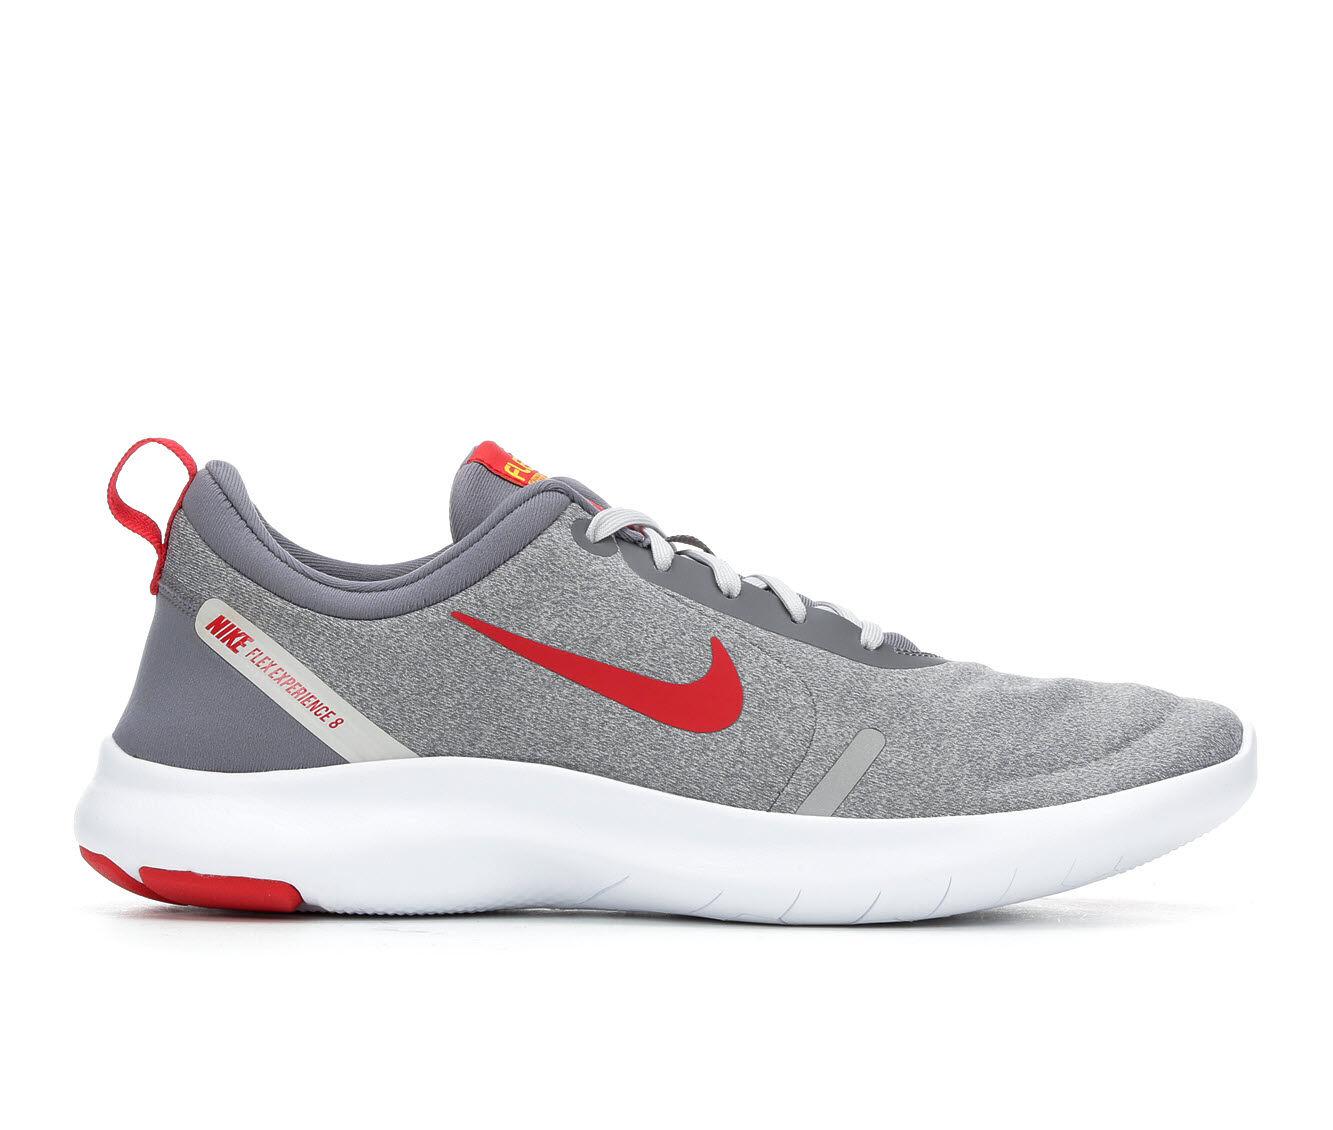 Nike Flex Shoes Men's Rn Running Experience 8 g6bf7yY